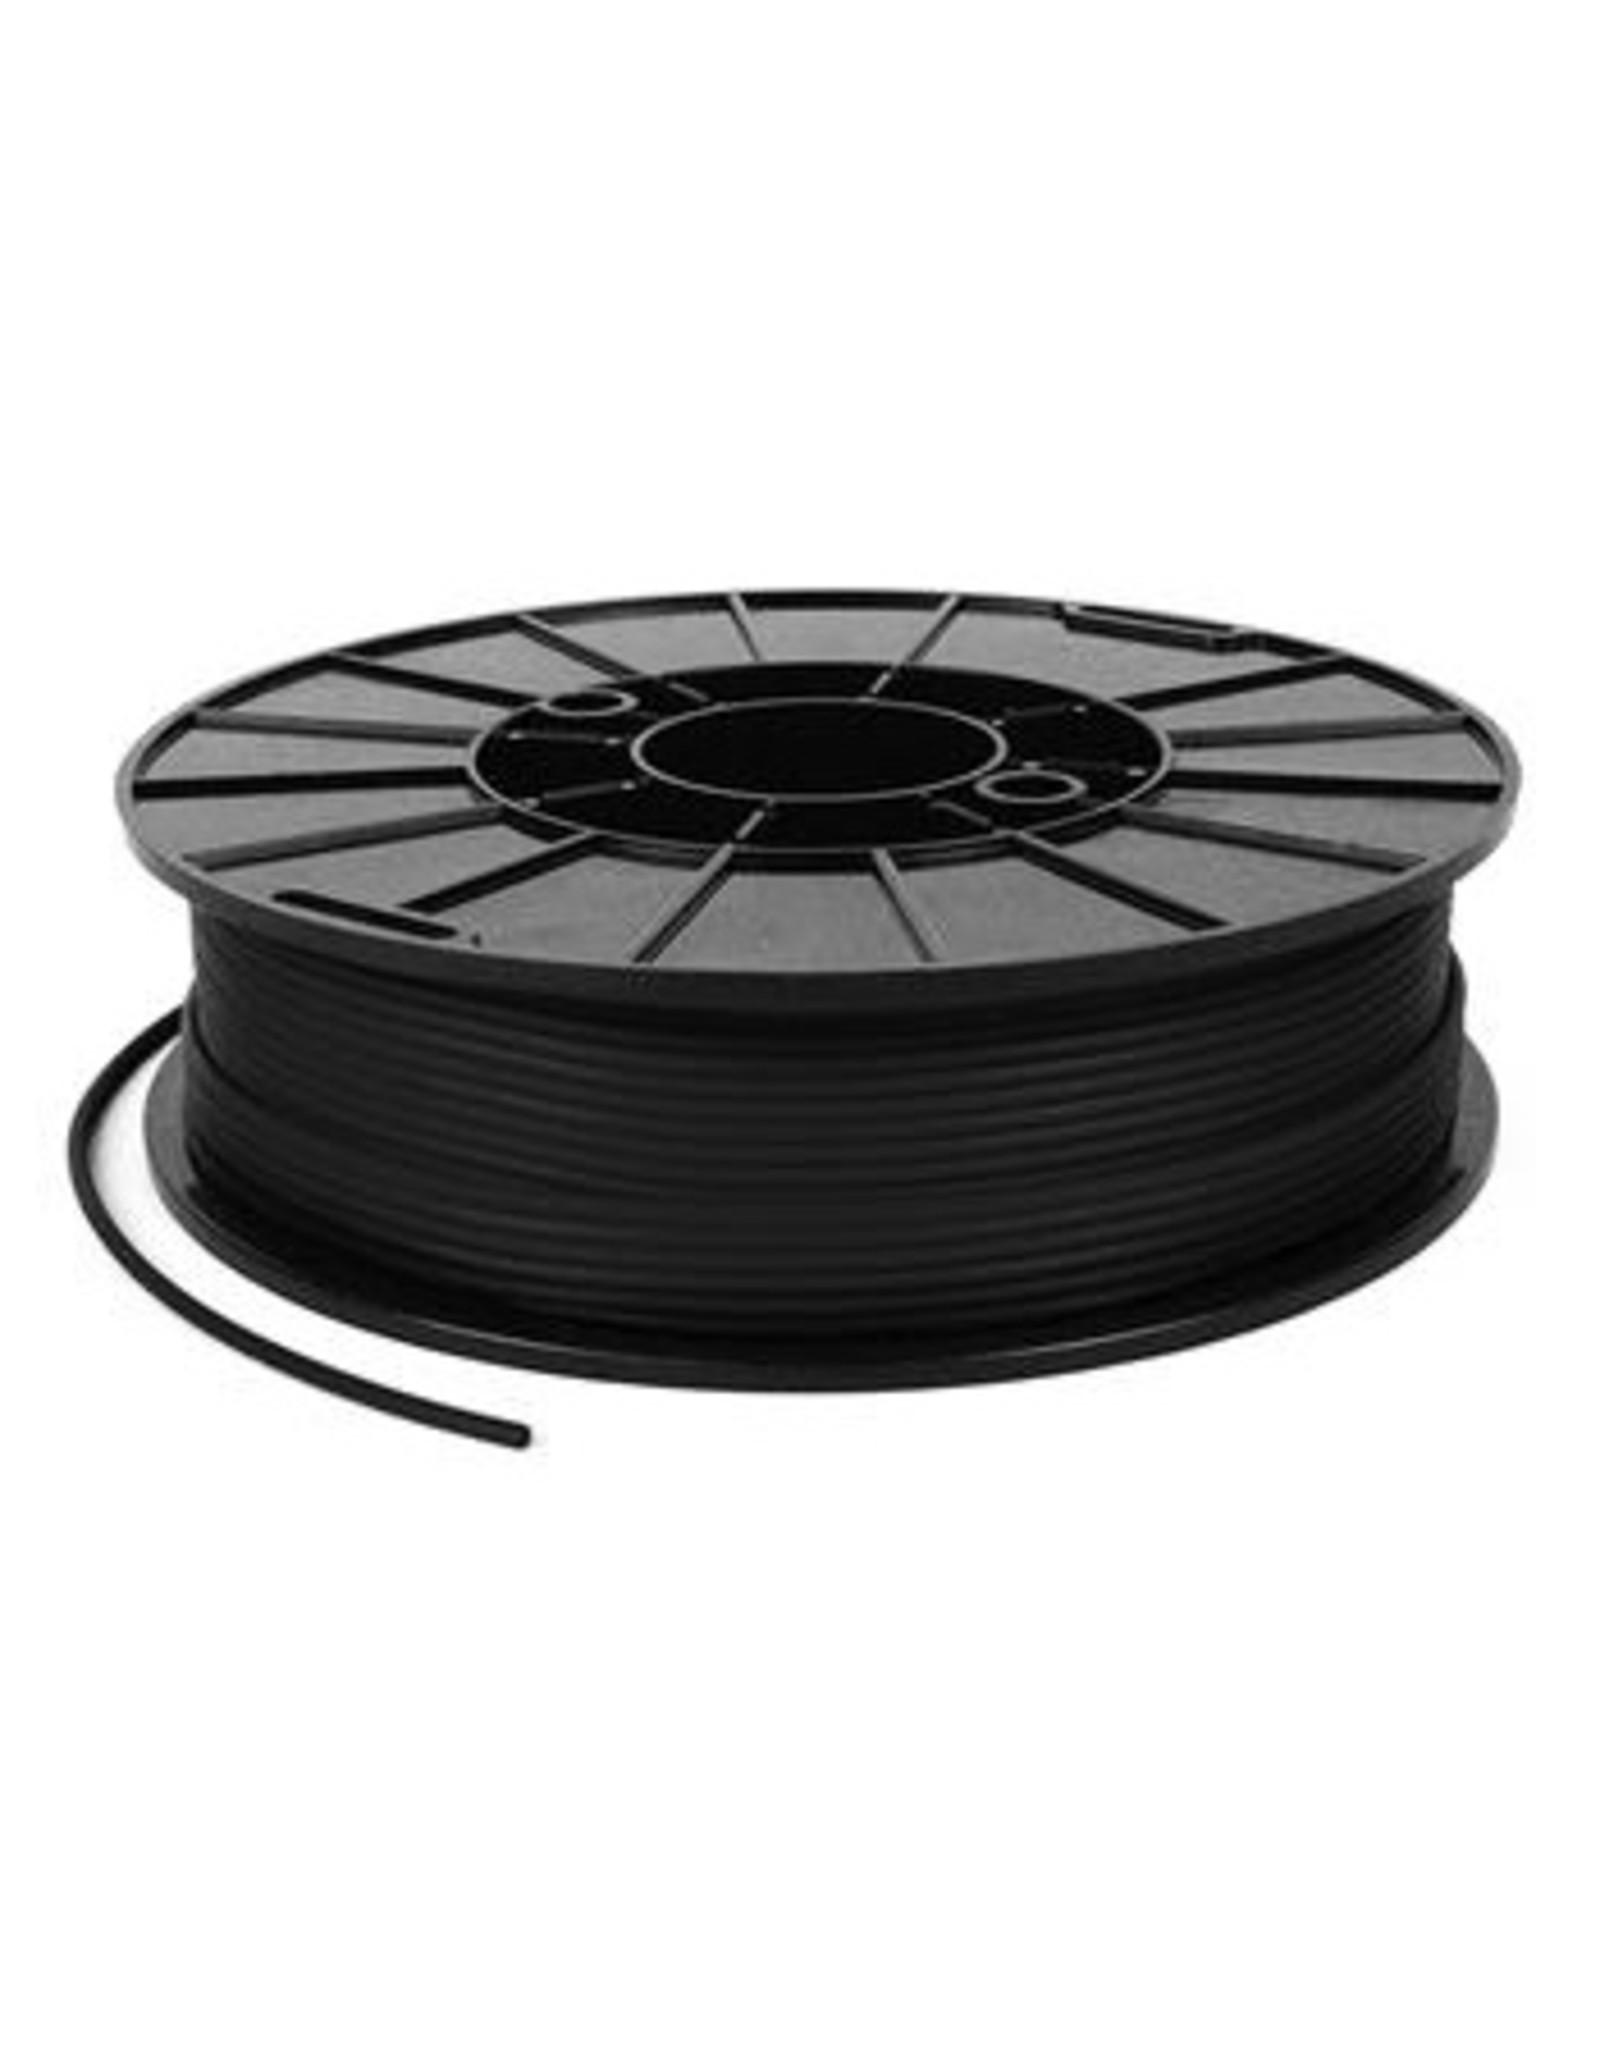 Ninja NinjaFlex Filament - 1.75mm - 0.5 kg - Noir de Minuit